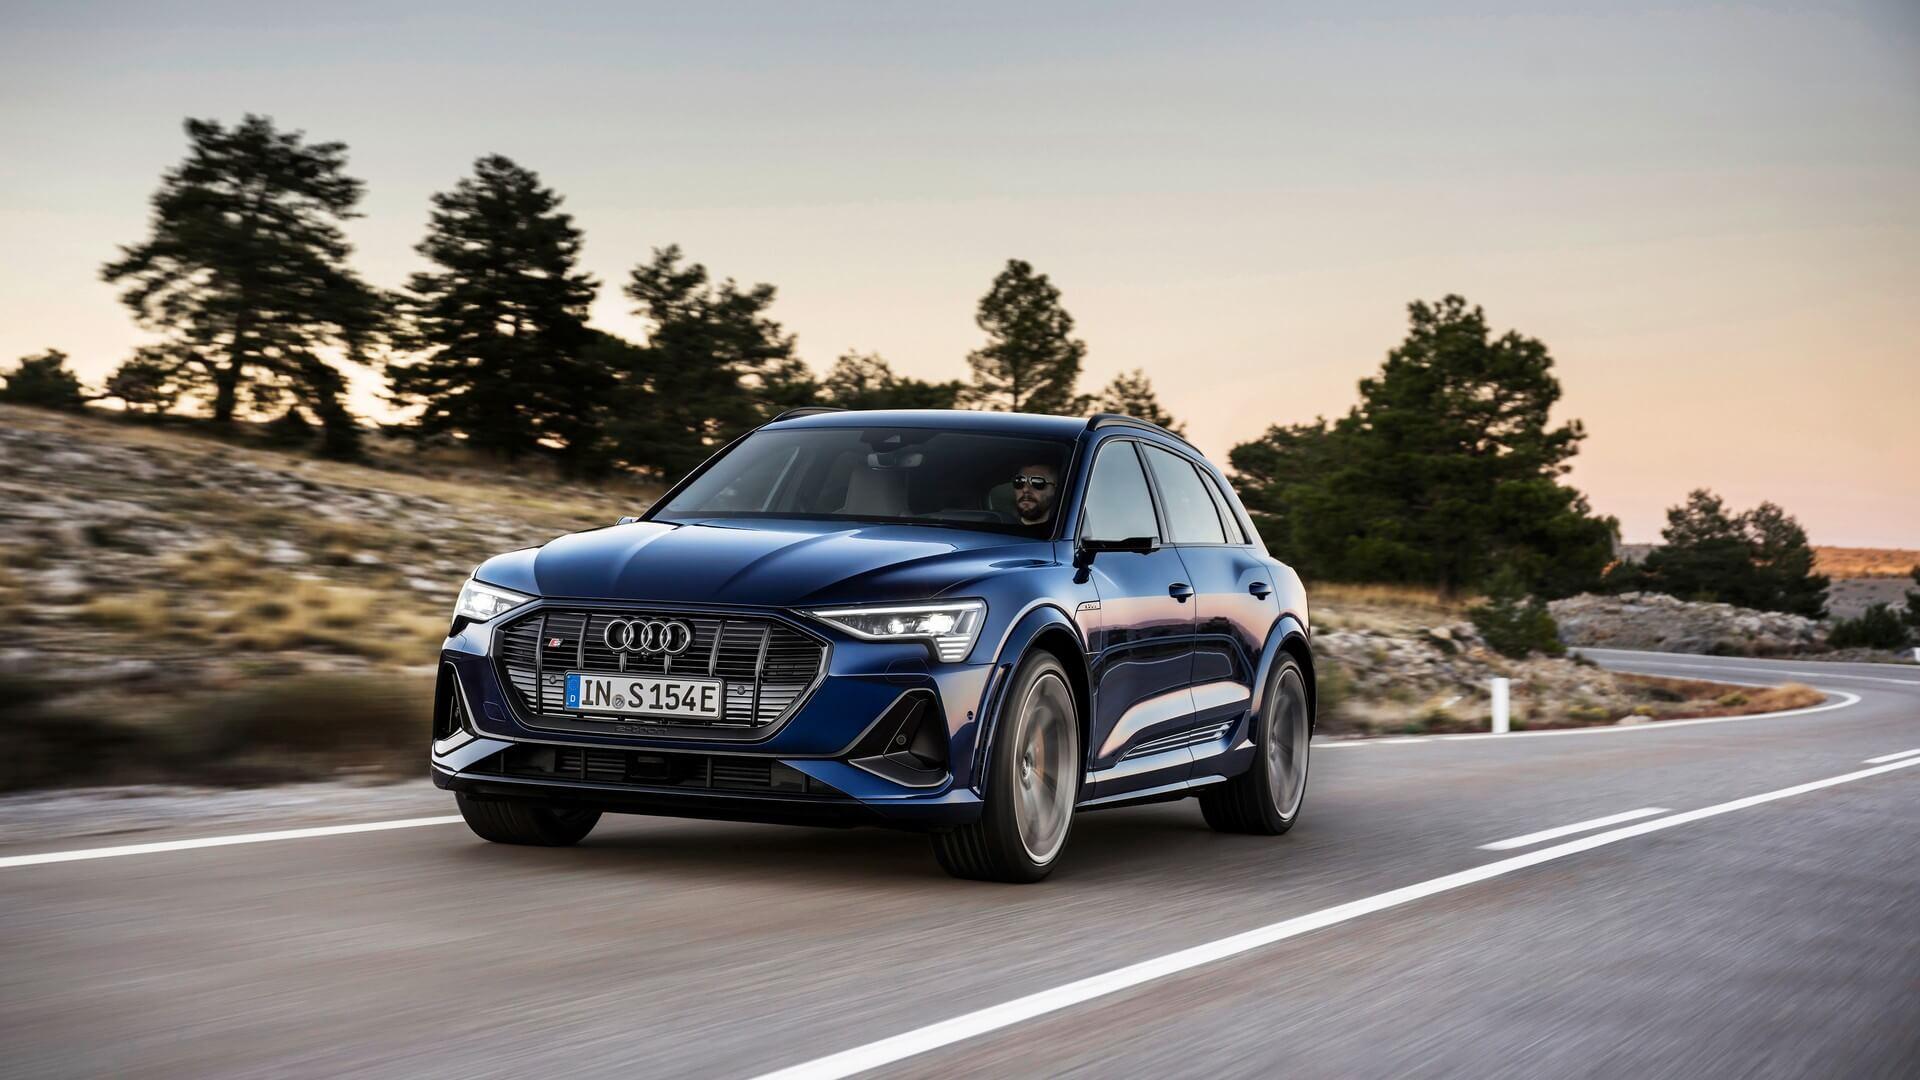 Audi-E-Tron-S-and-E-Tron-S-Sportback-2020-16